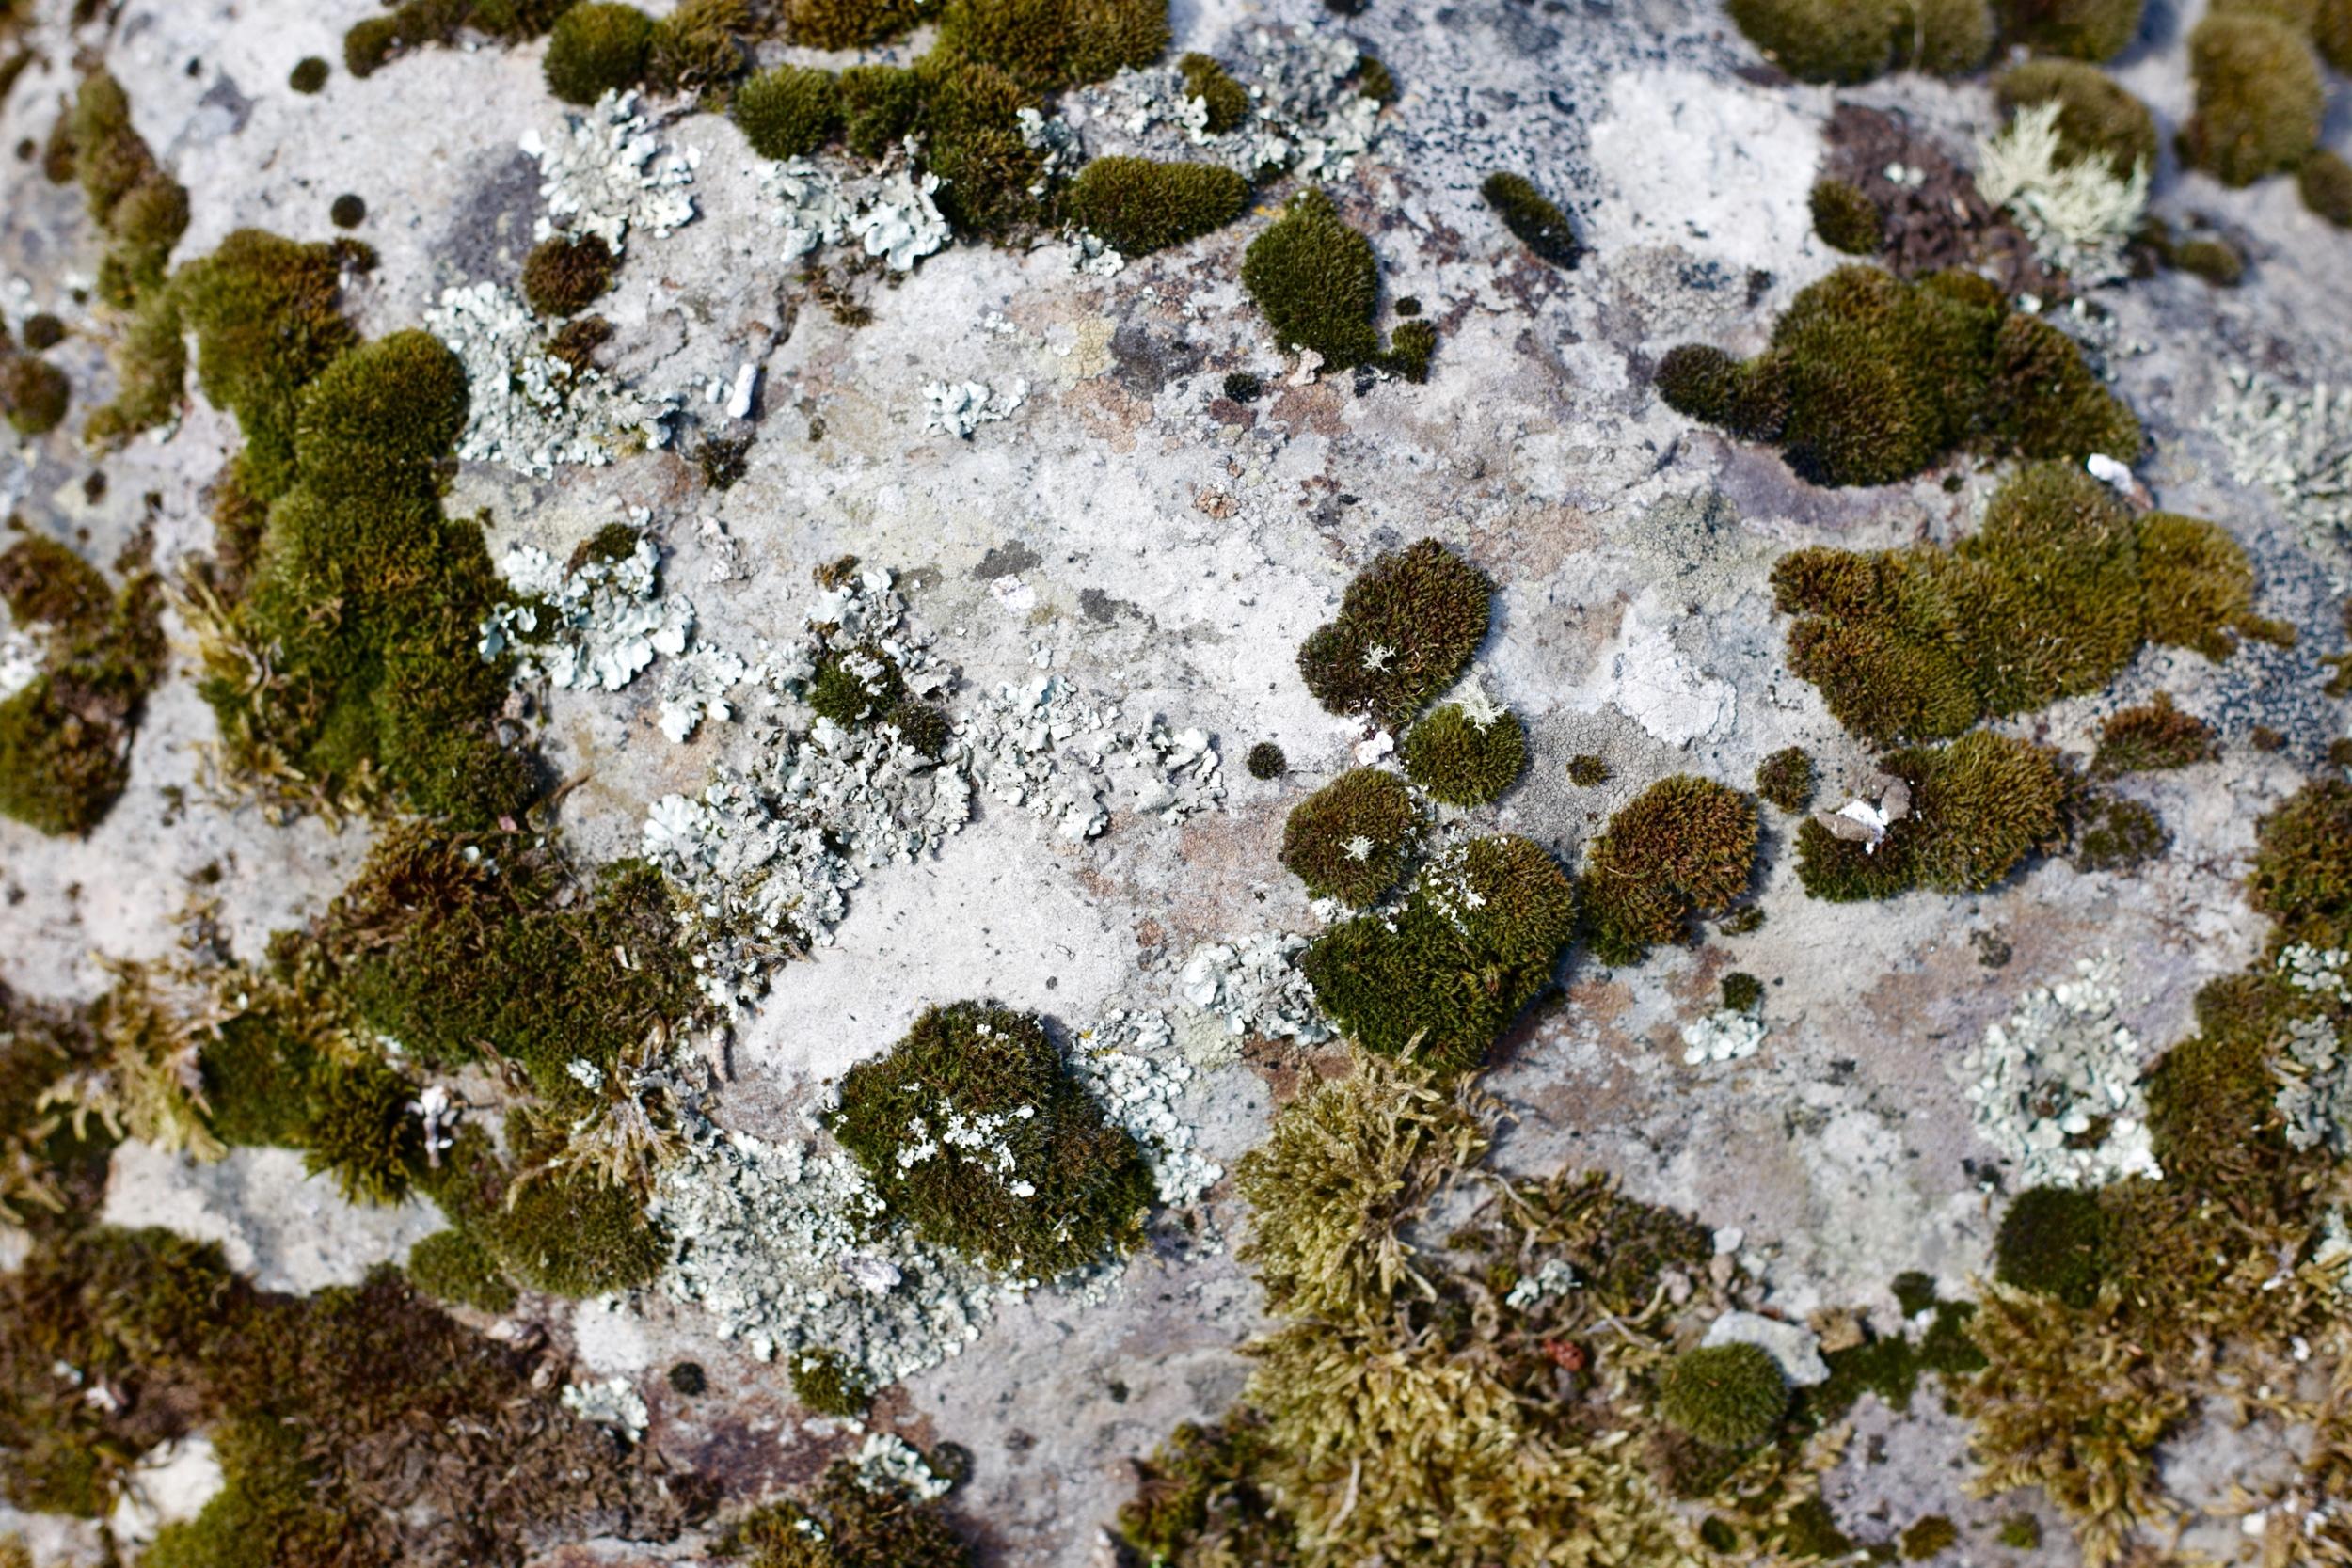 Moss growing on rocks in a fairy dell.